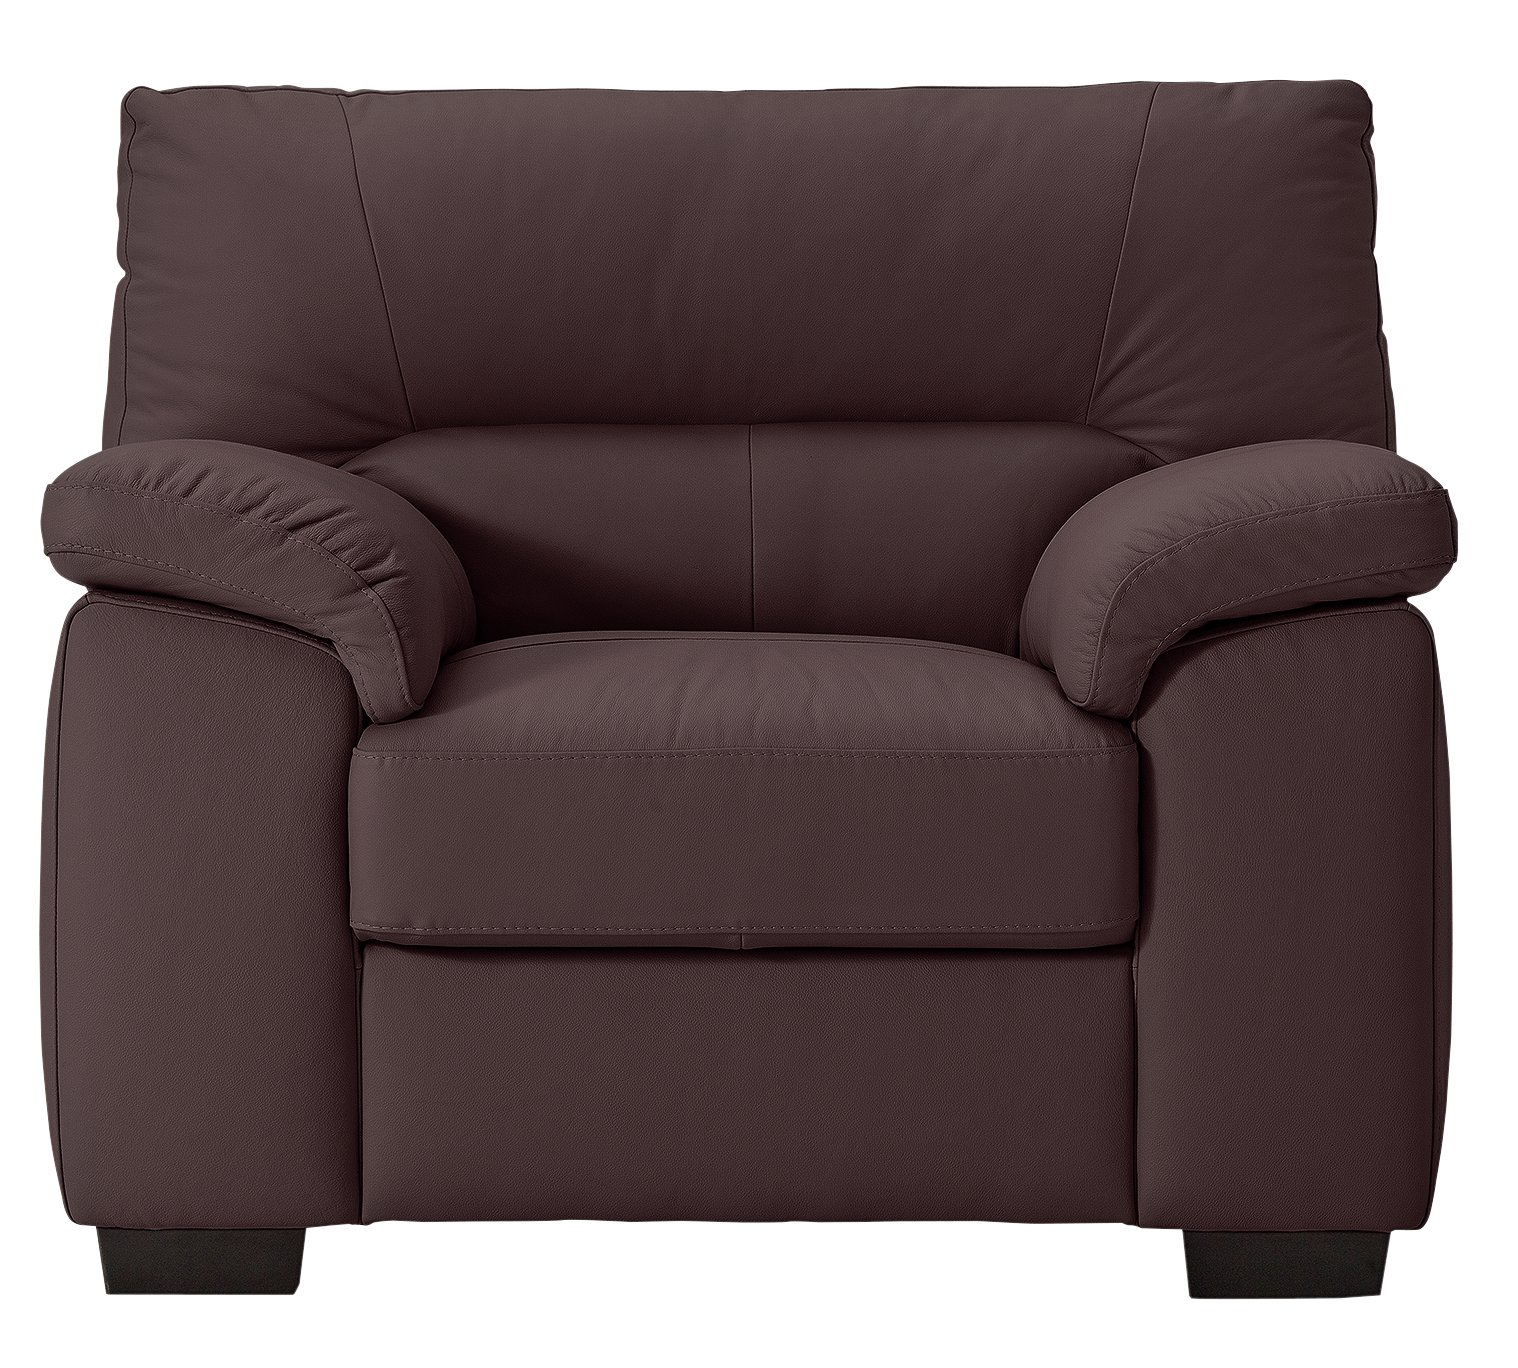 Argos Home Piacenza Leather Armchair - Walnut